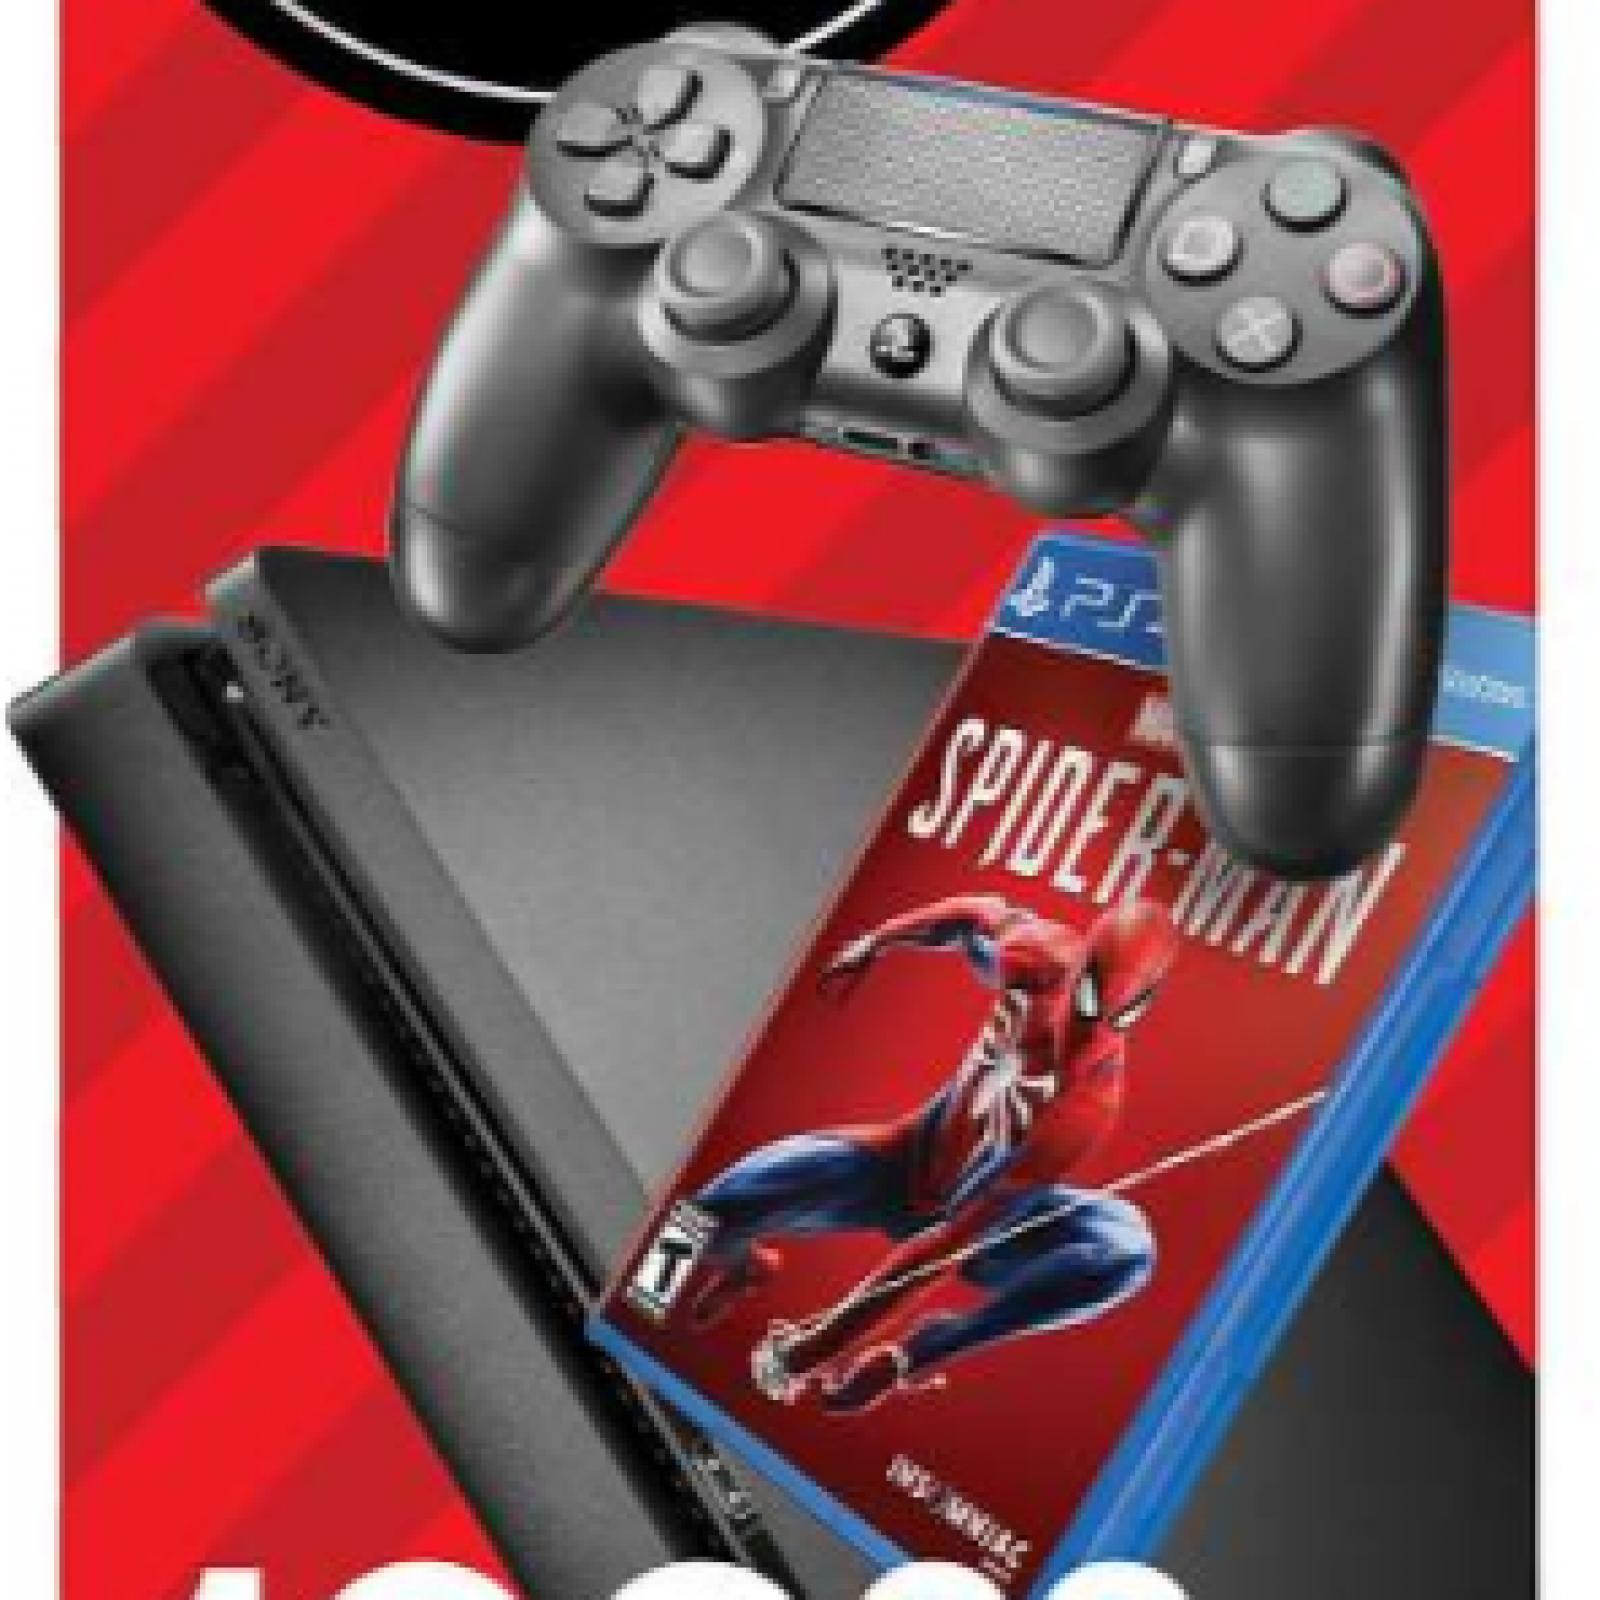 Black Friday PS4 Deals: 1TB PS4 Slim 'Spider-Man' Bundle